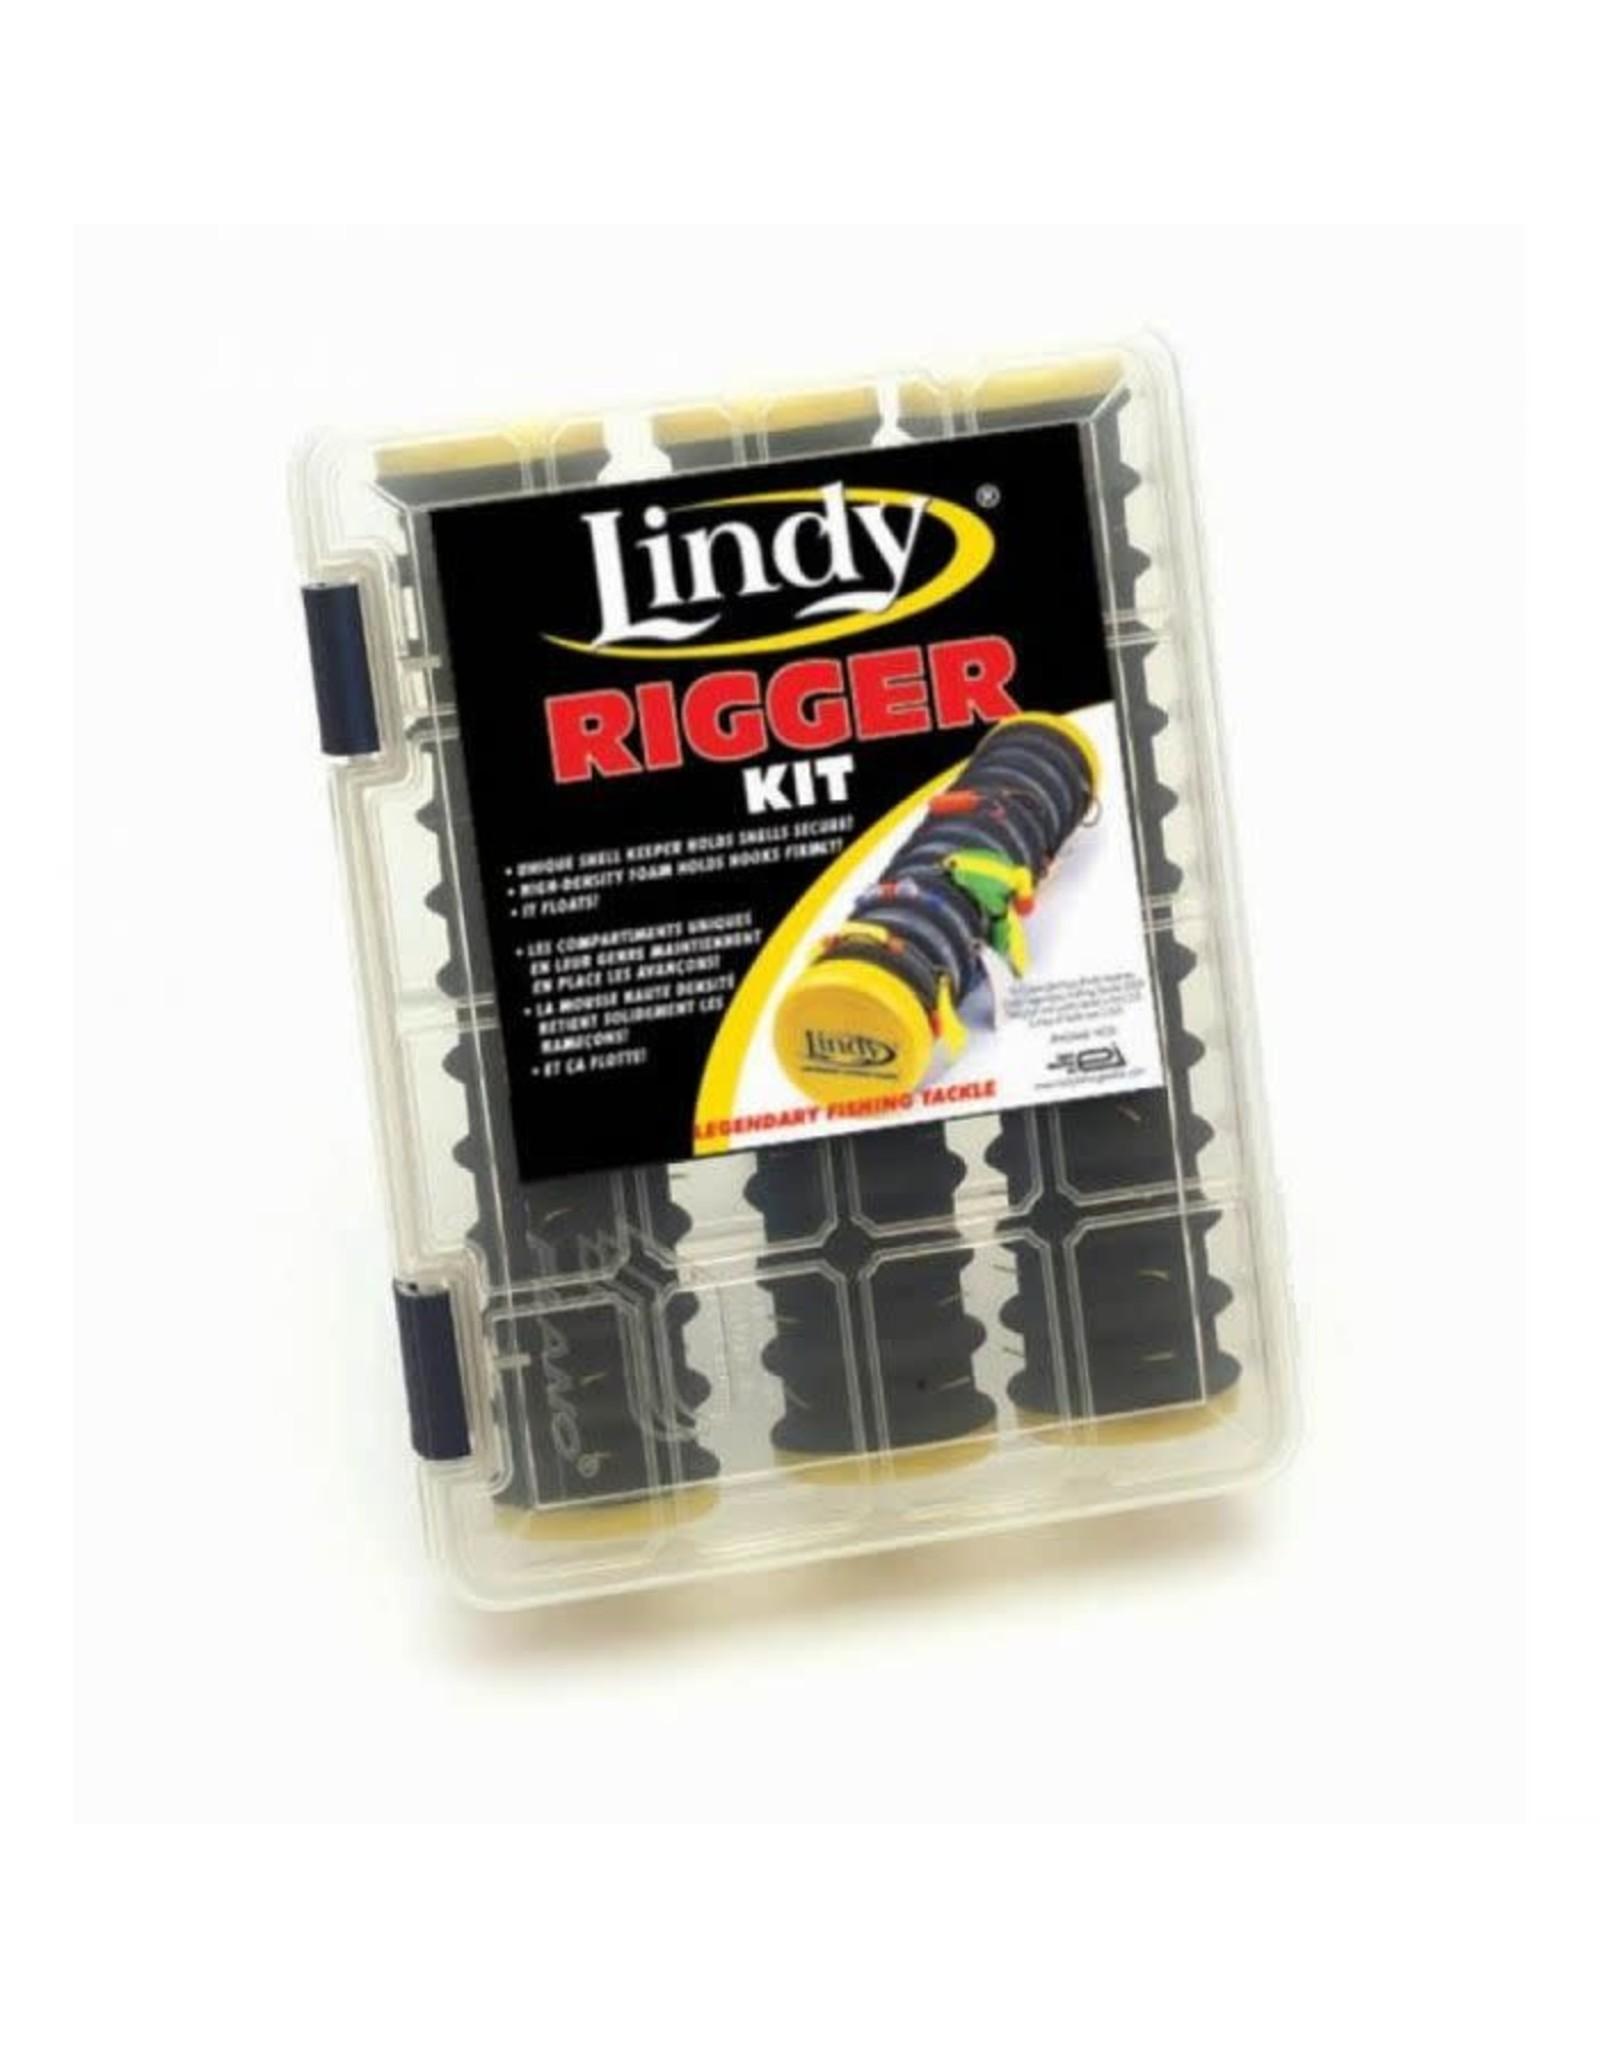 Lindy Lindy Rigger Kit 3/box